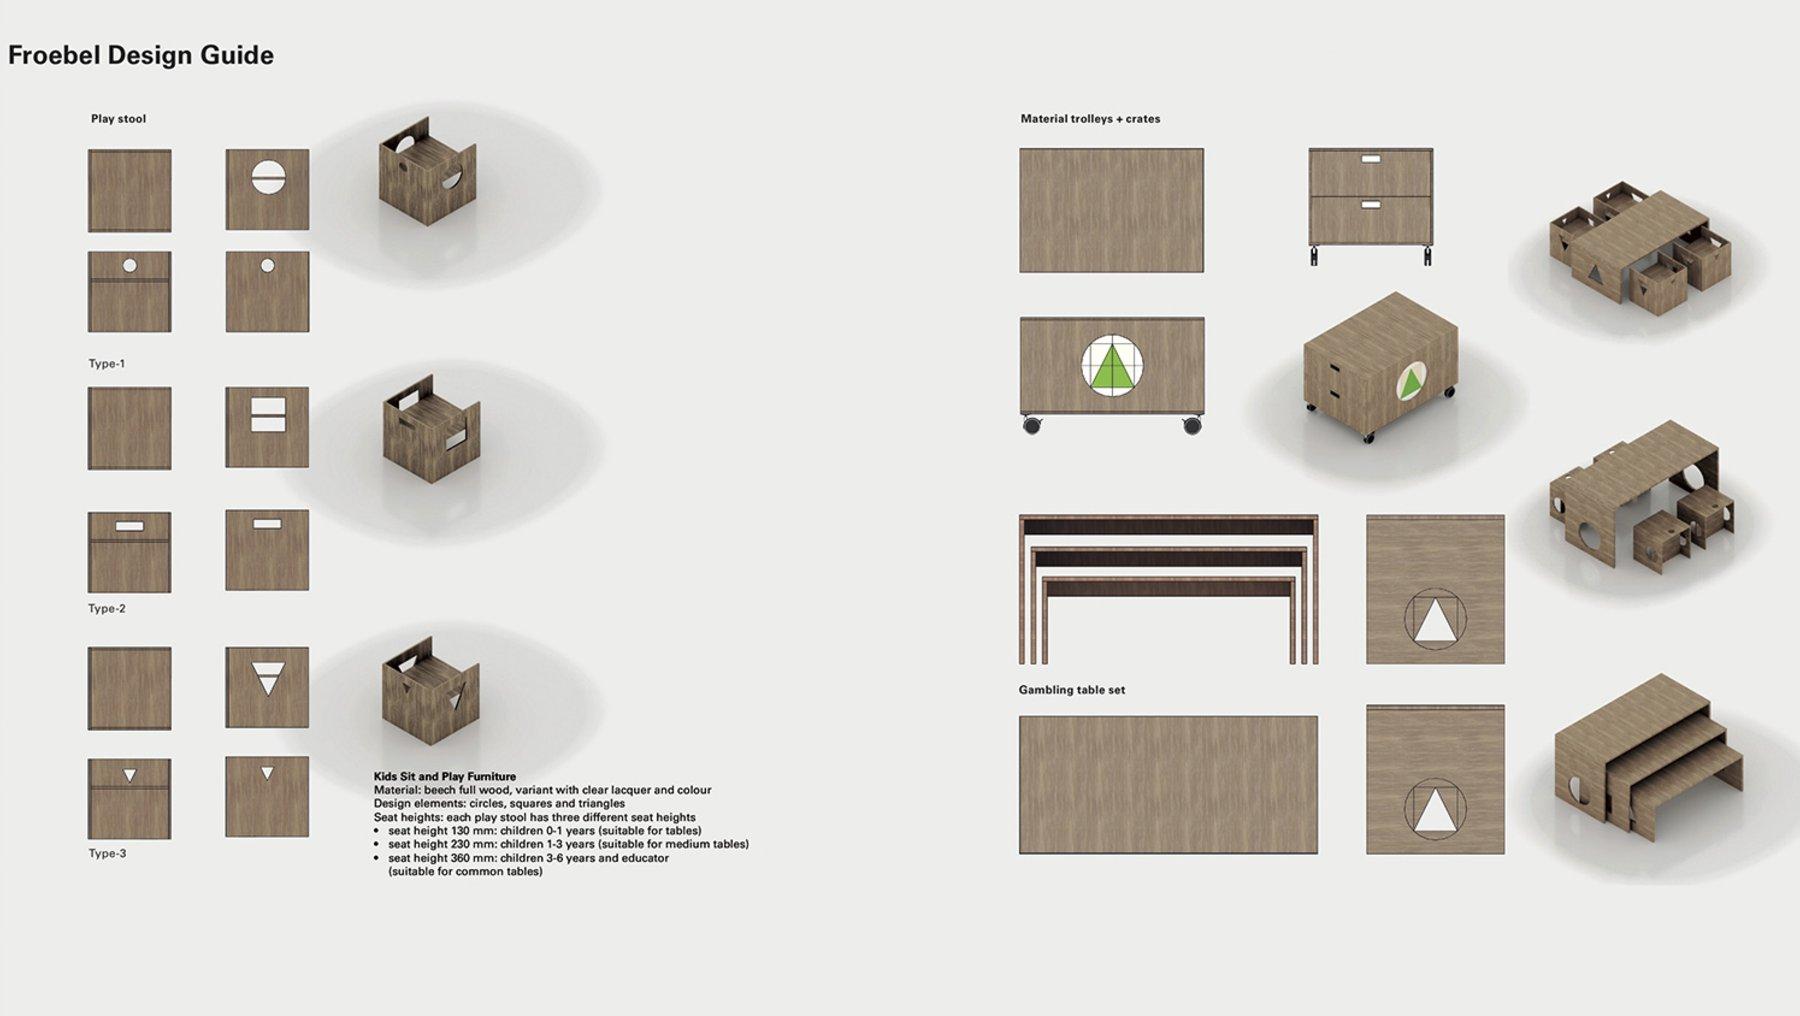 Children's Playhouse - The Urban Nursery School